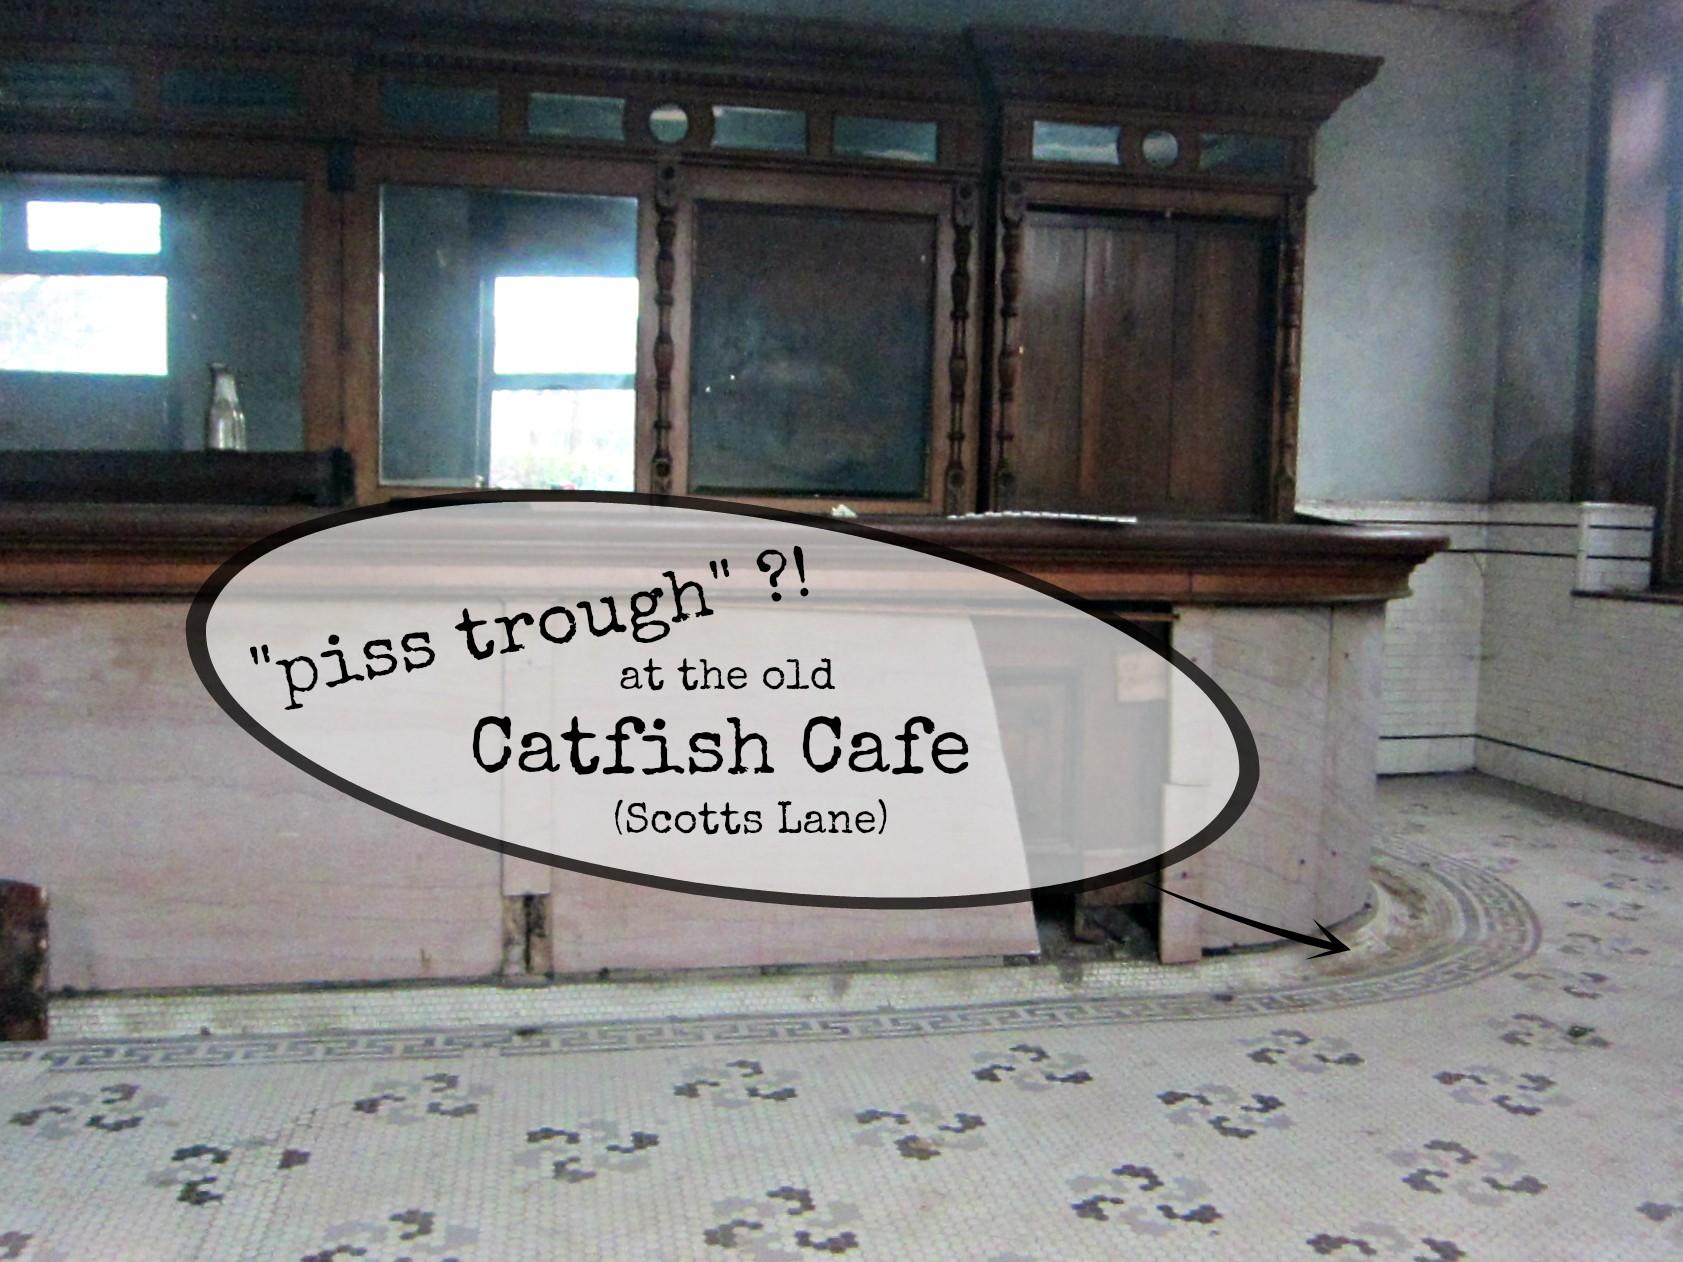 EastFallsLocal Catfish Cafe East Falls scotts lane peek text